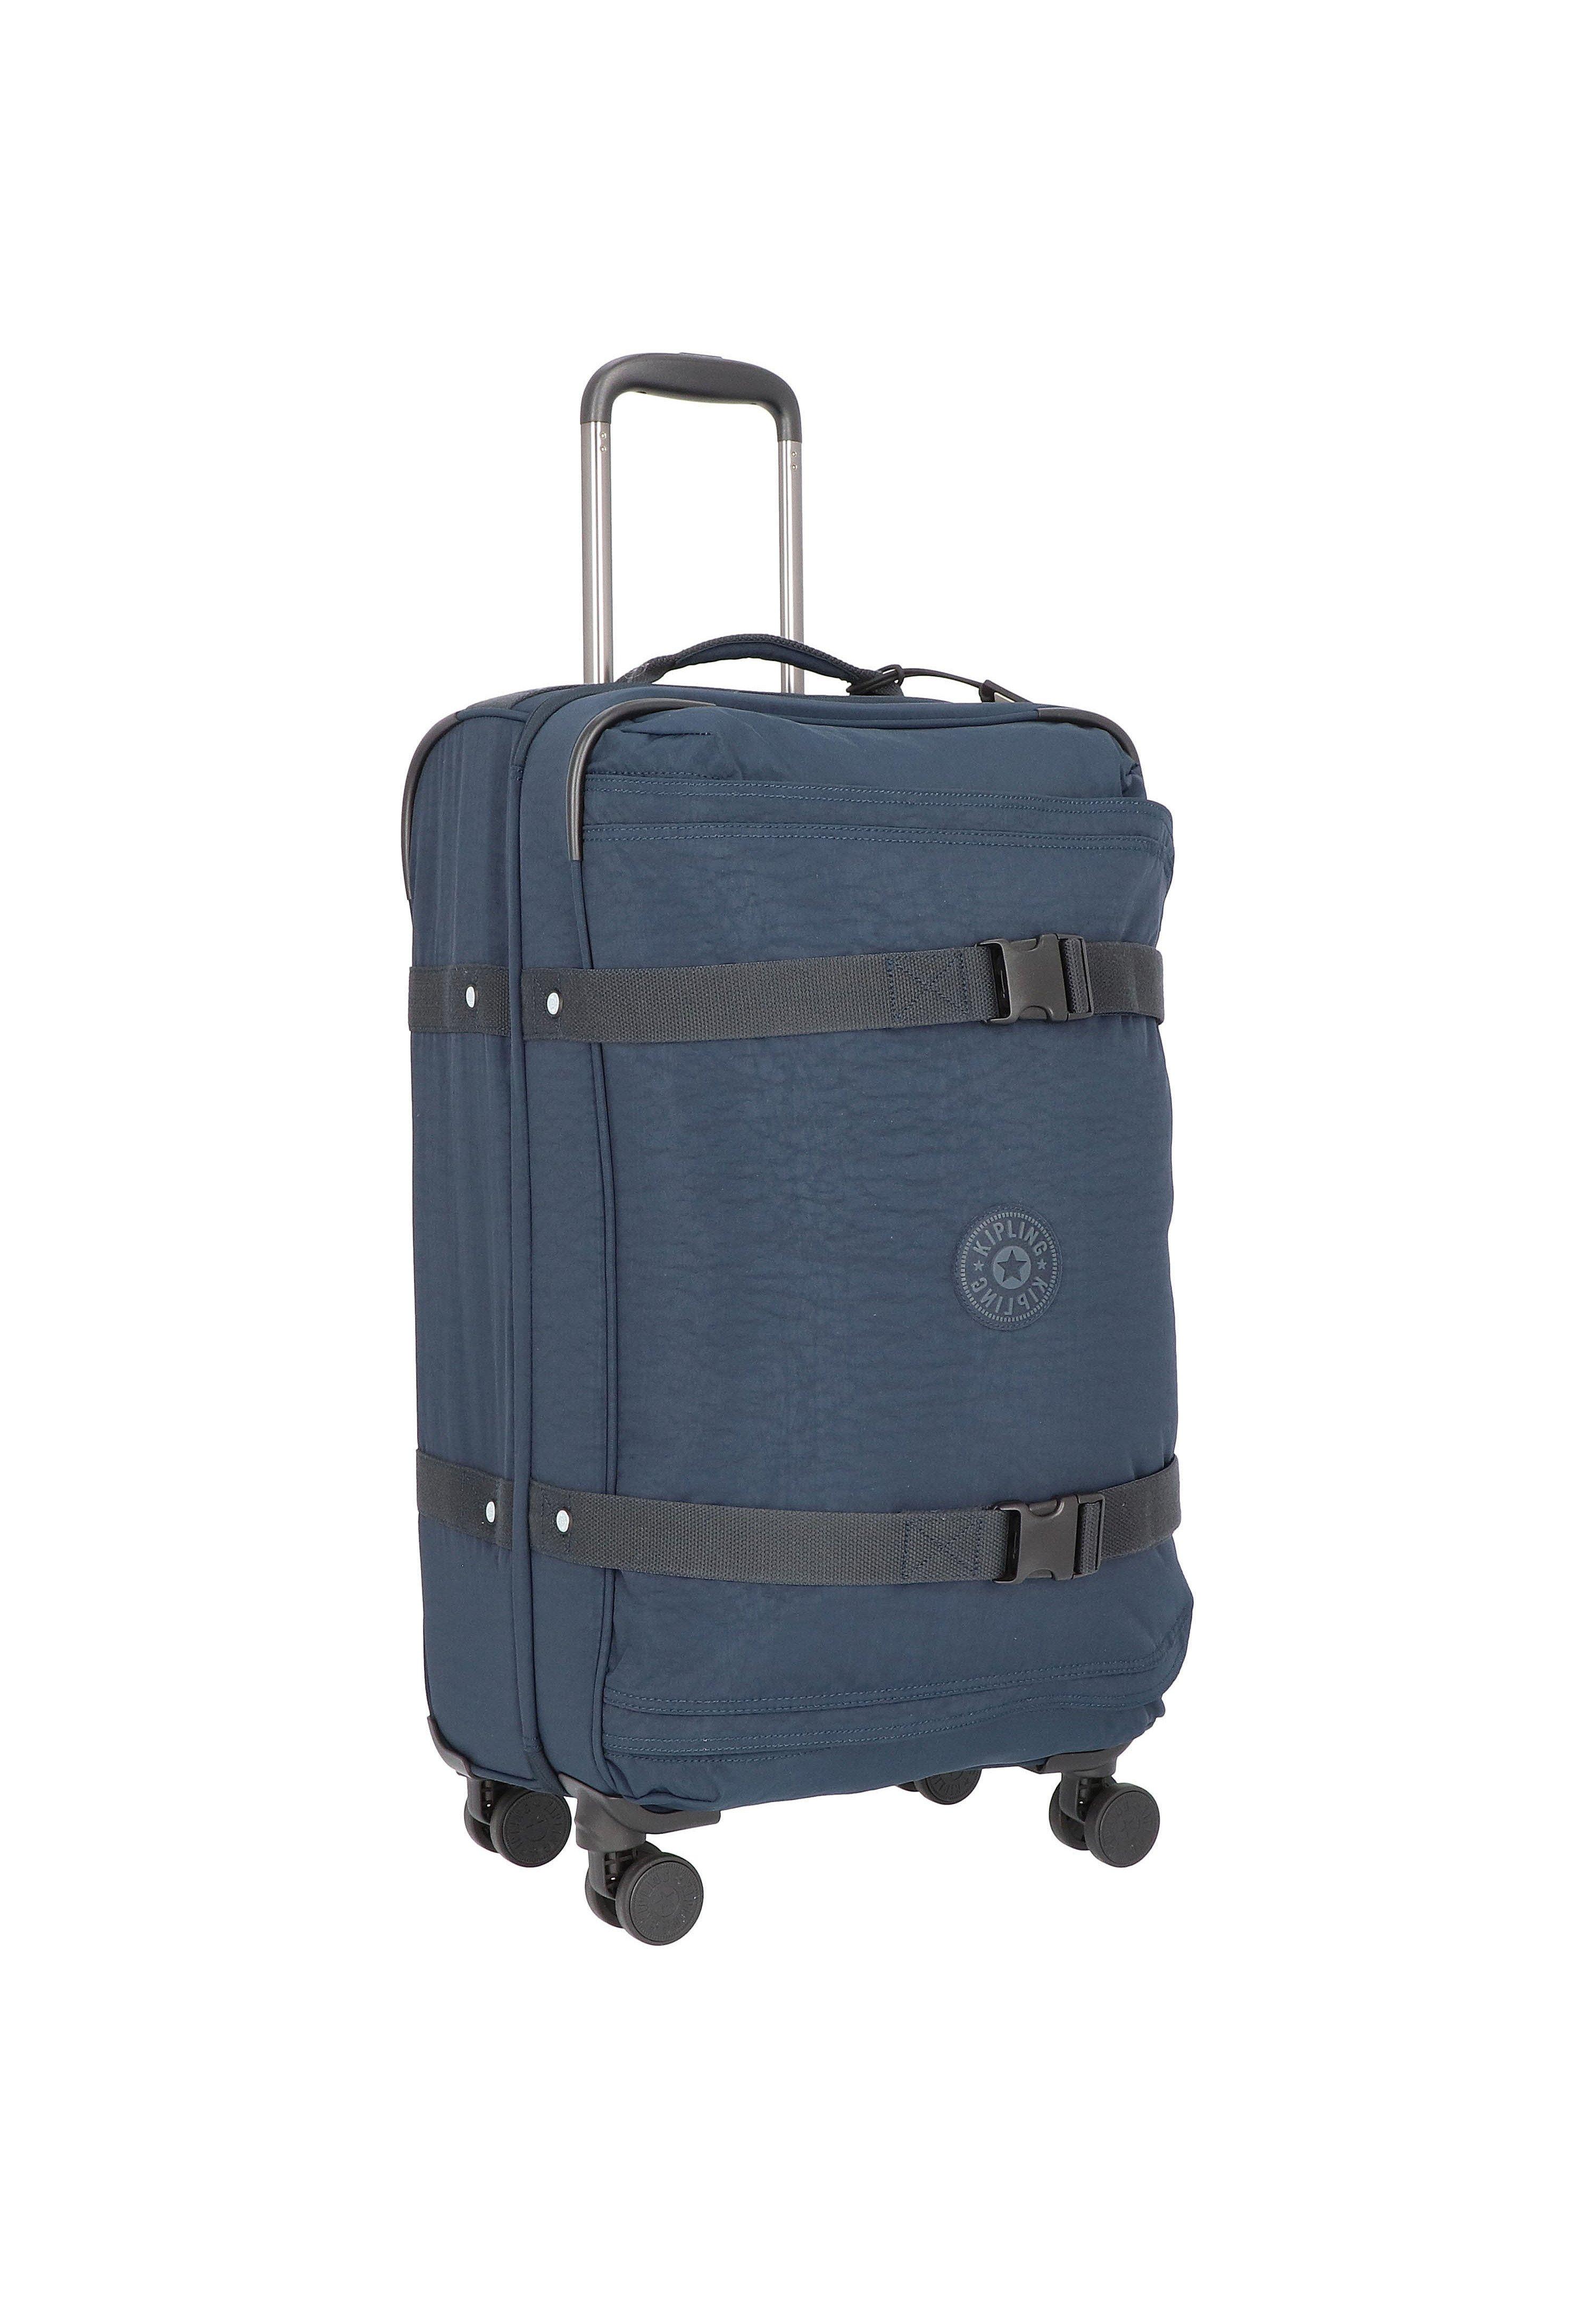 Kipling Trolley - blue/blau - Herrentaschen 6MPUz